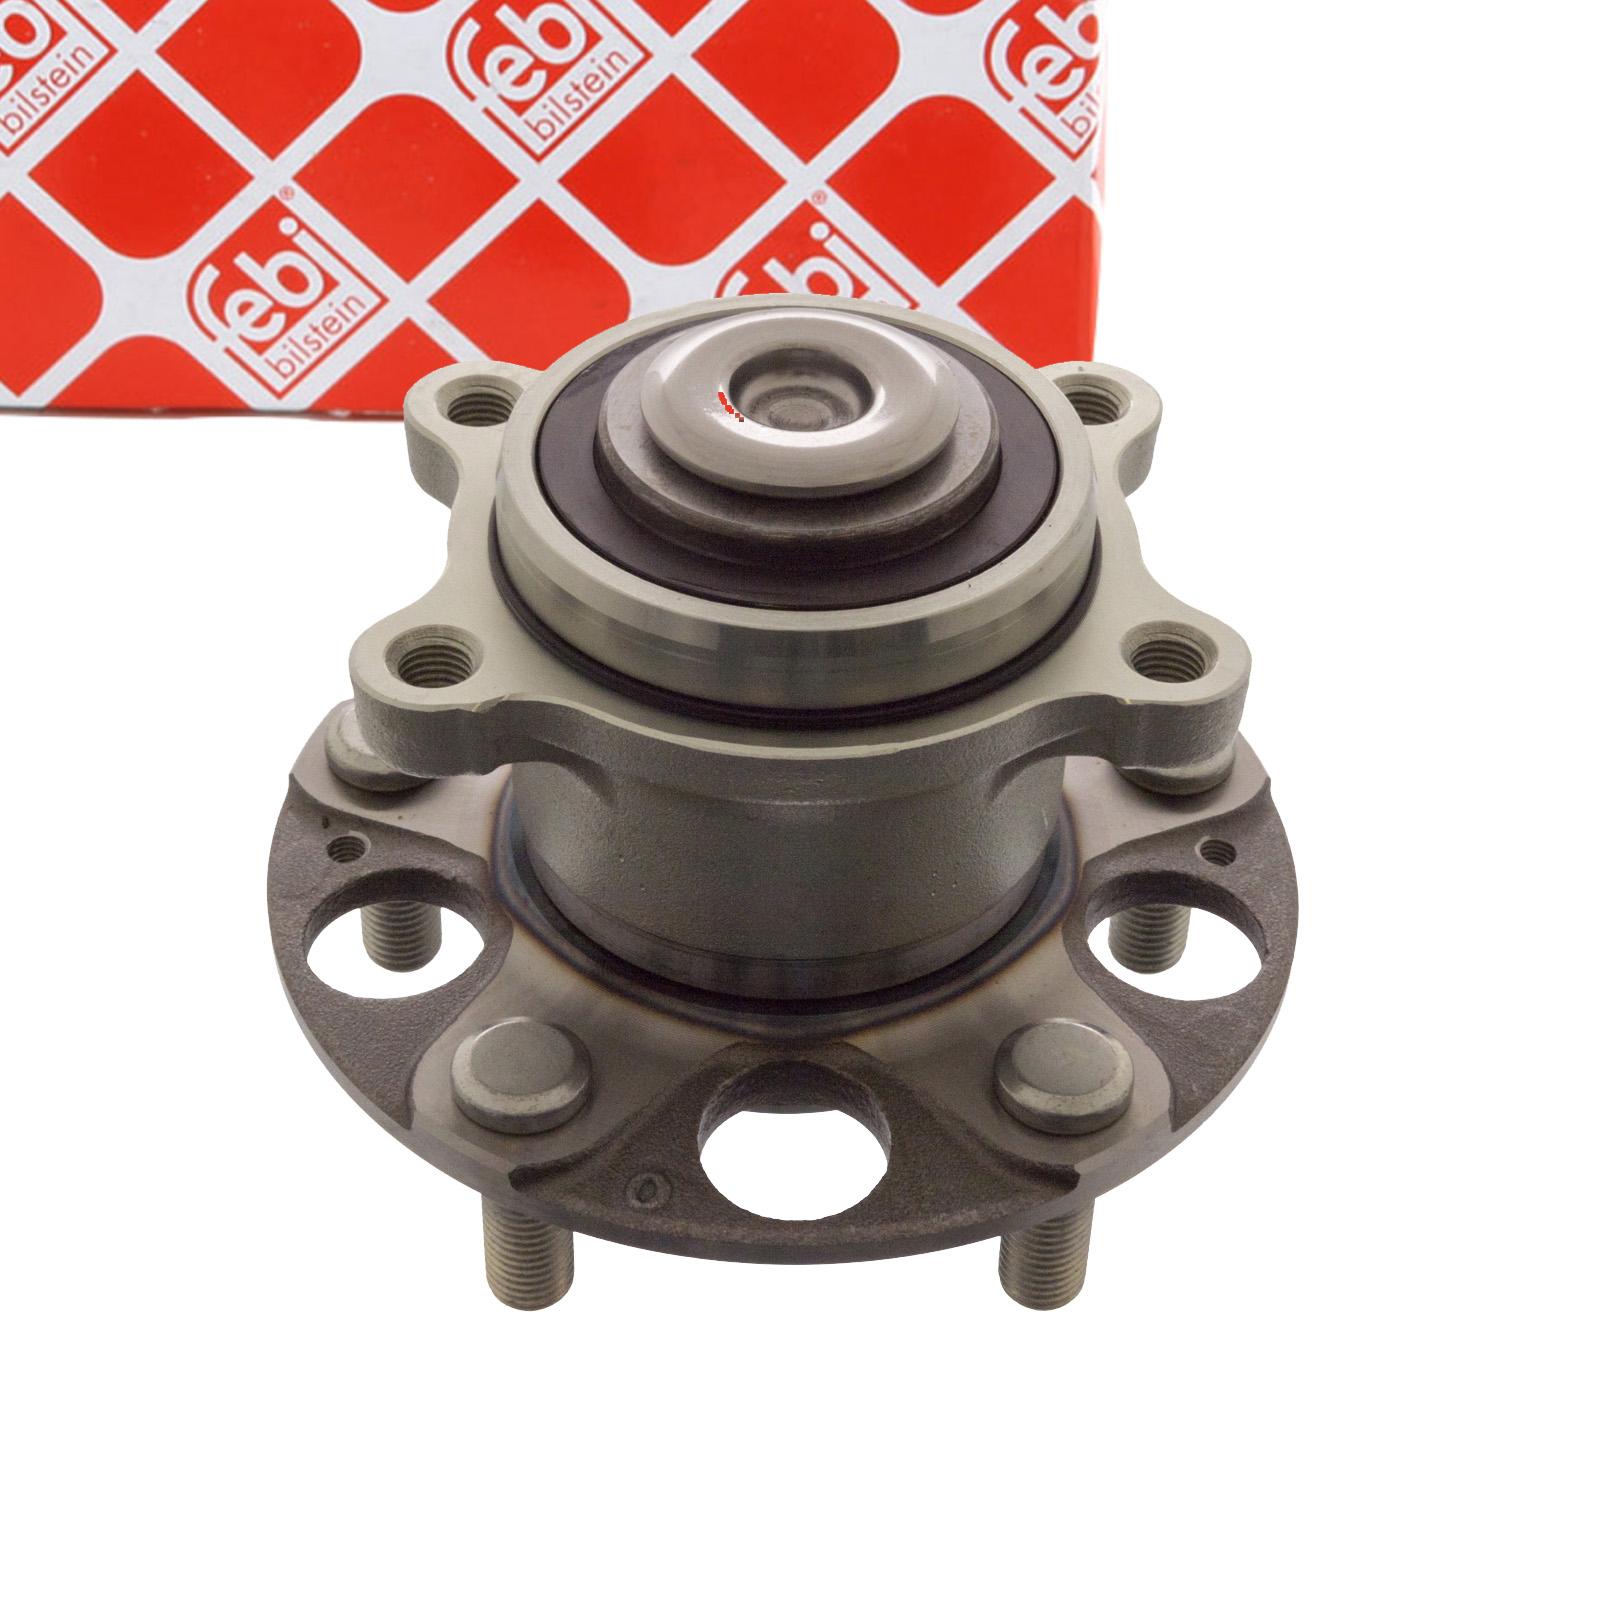 FEBI 33929 Radlagersatz Radnabe Radlager HONDA Accord 2 2.0-2.4 / 2.2 i-CTDi hinten